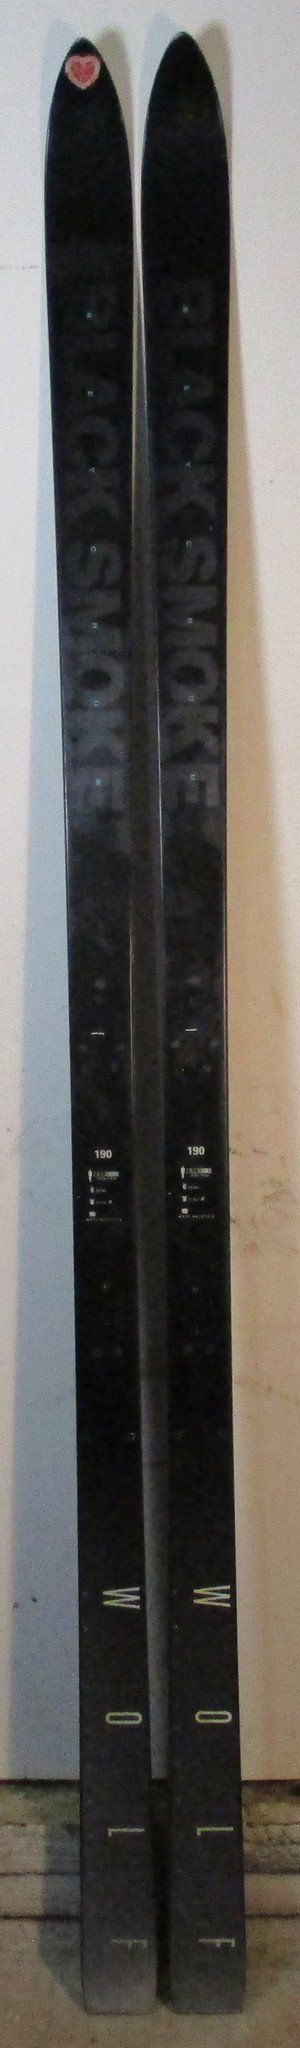 Used Wolf Ski Company Black Smoke 190 cm Snow Ski For Sale